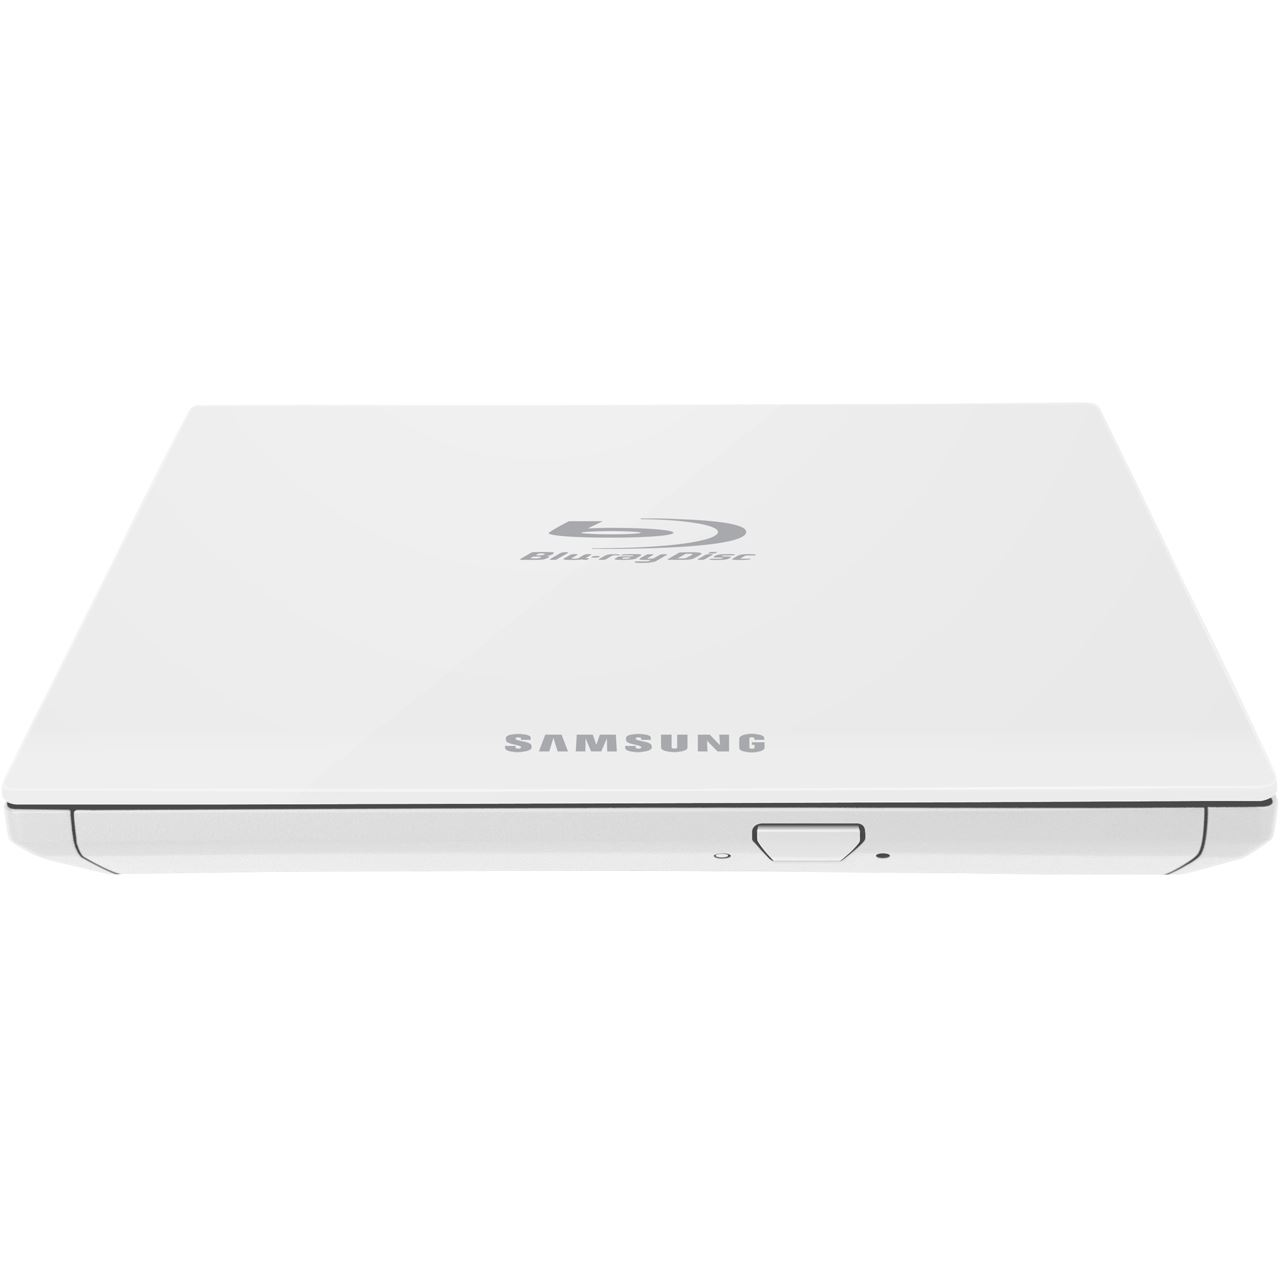 Samsung SE-506CB Blu-ray Disc Writer USB 2.0 extern weiss Retail ...